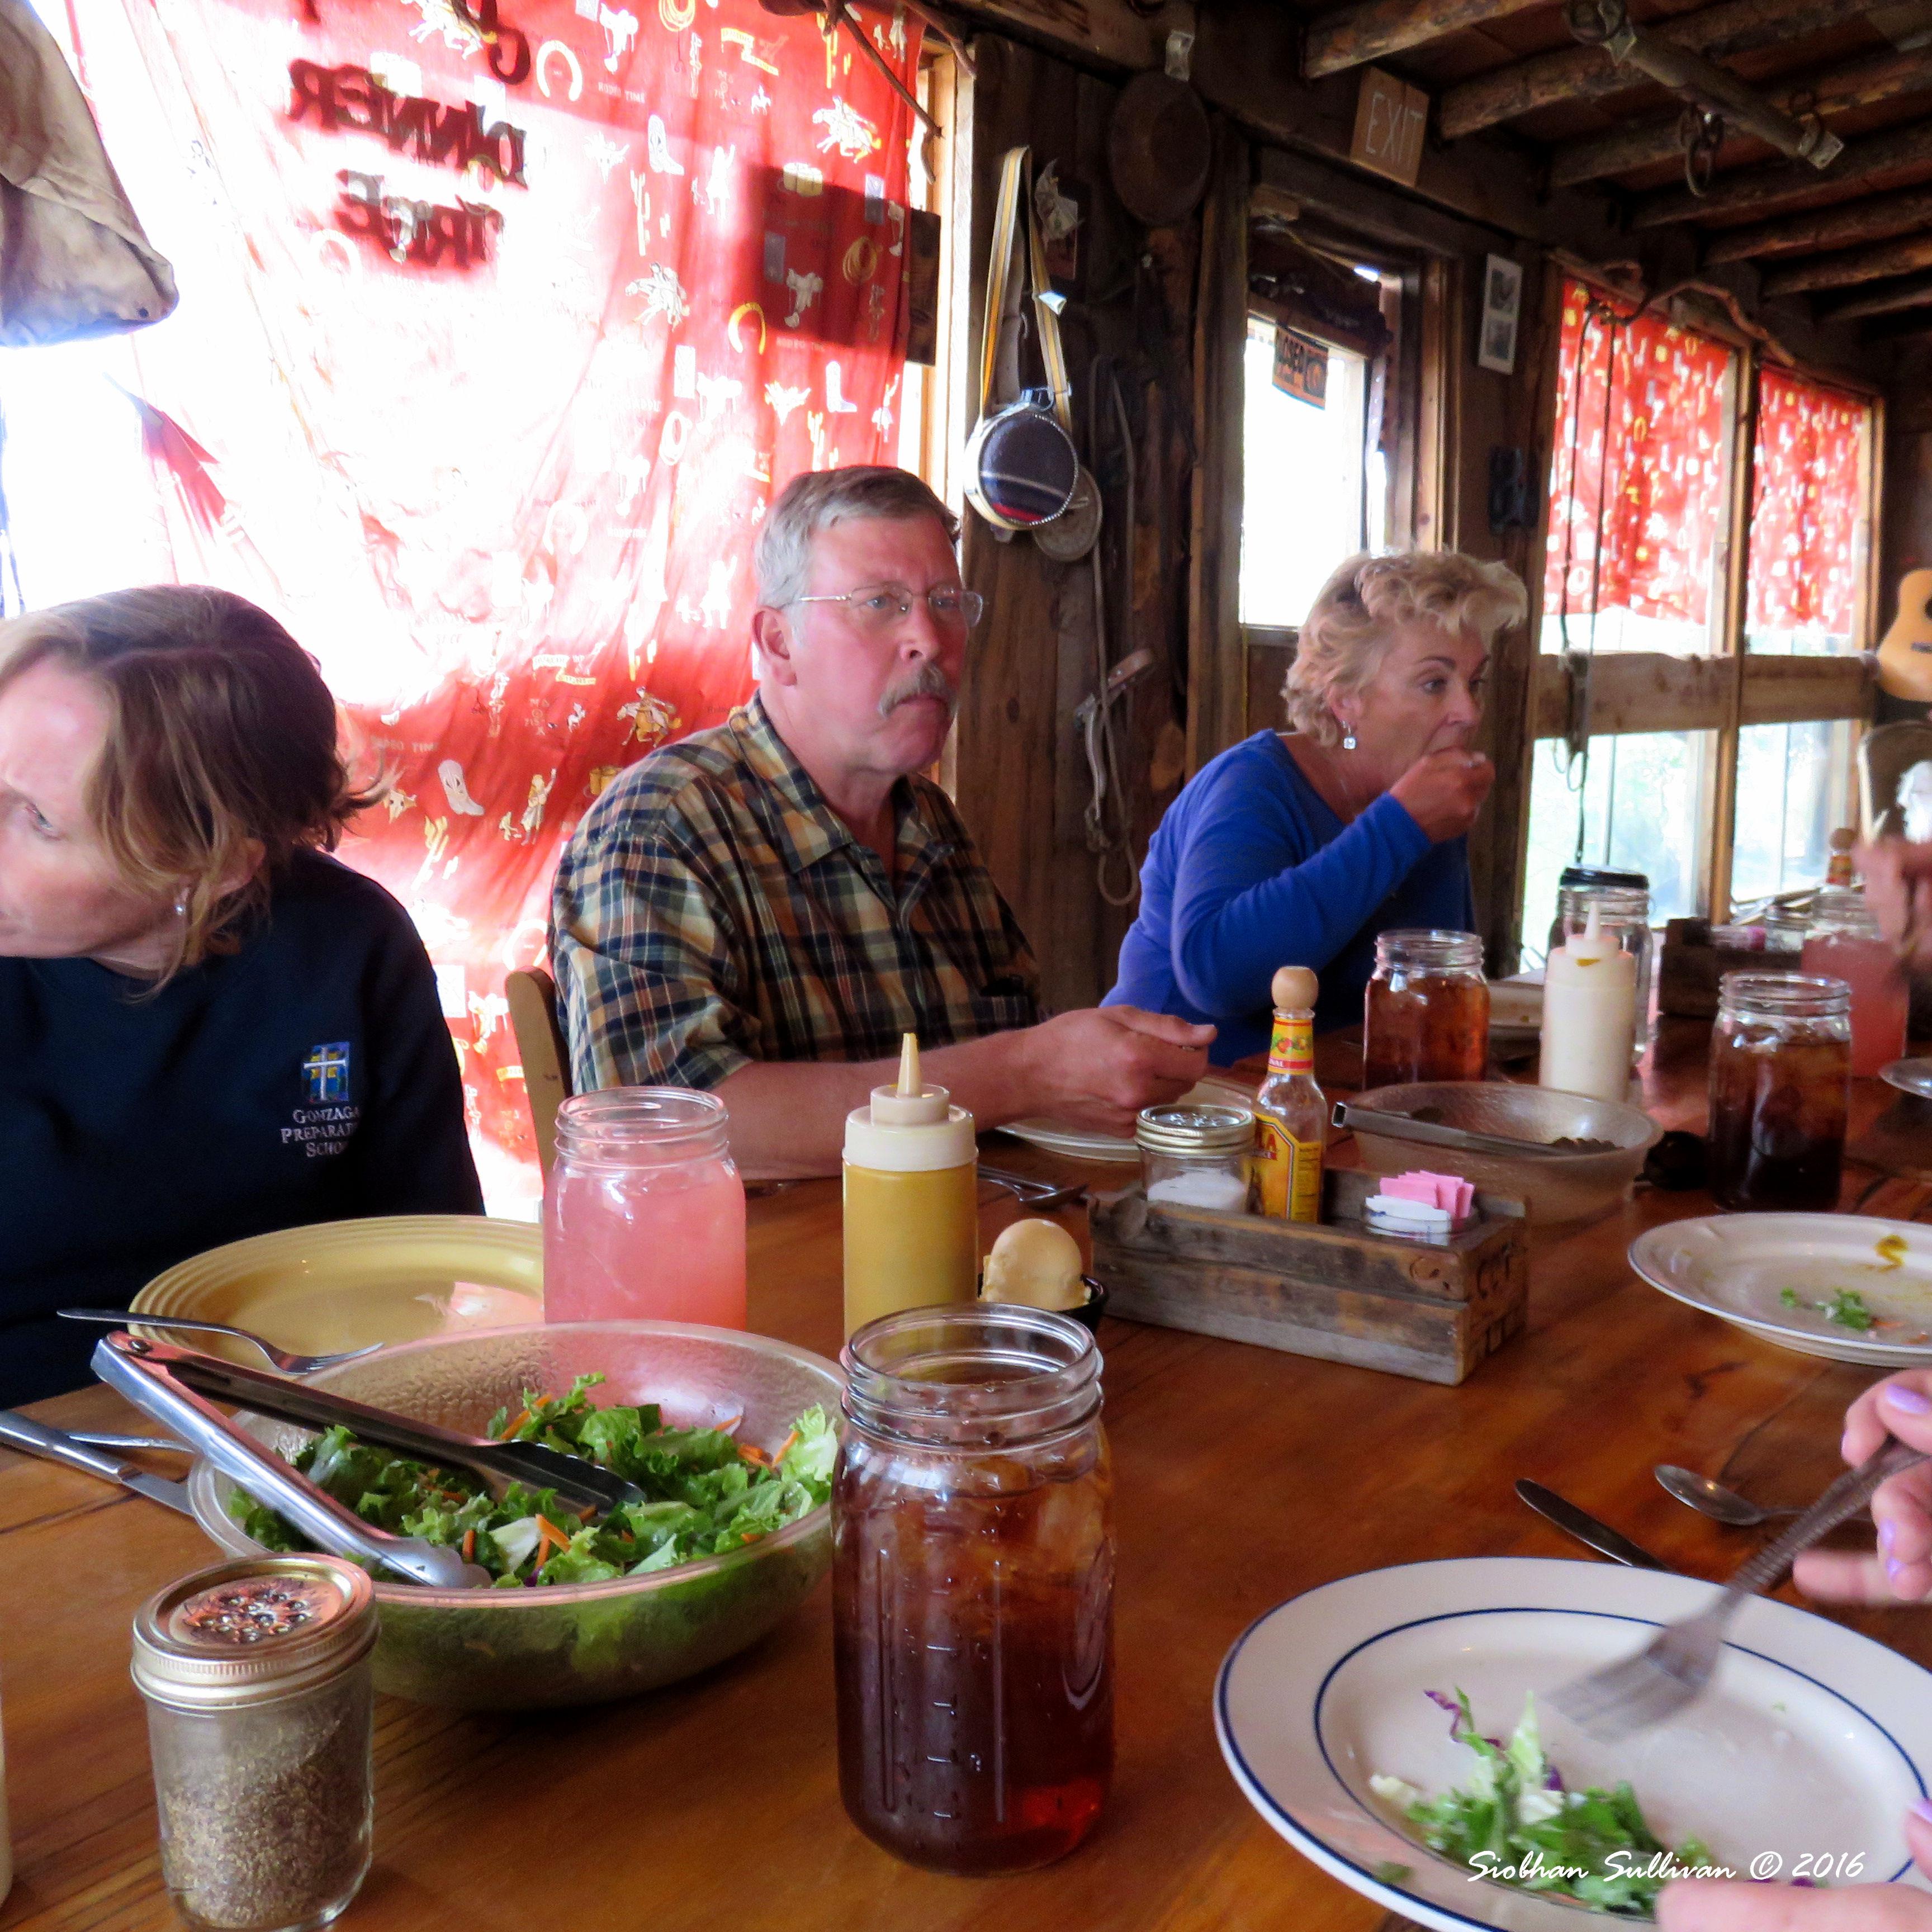 Salad and group table